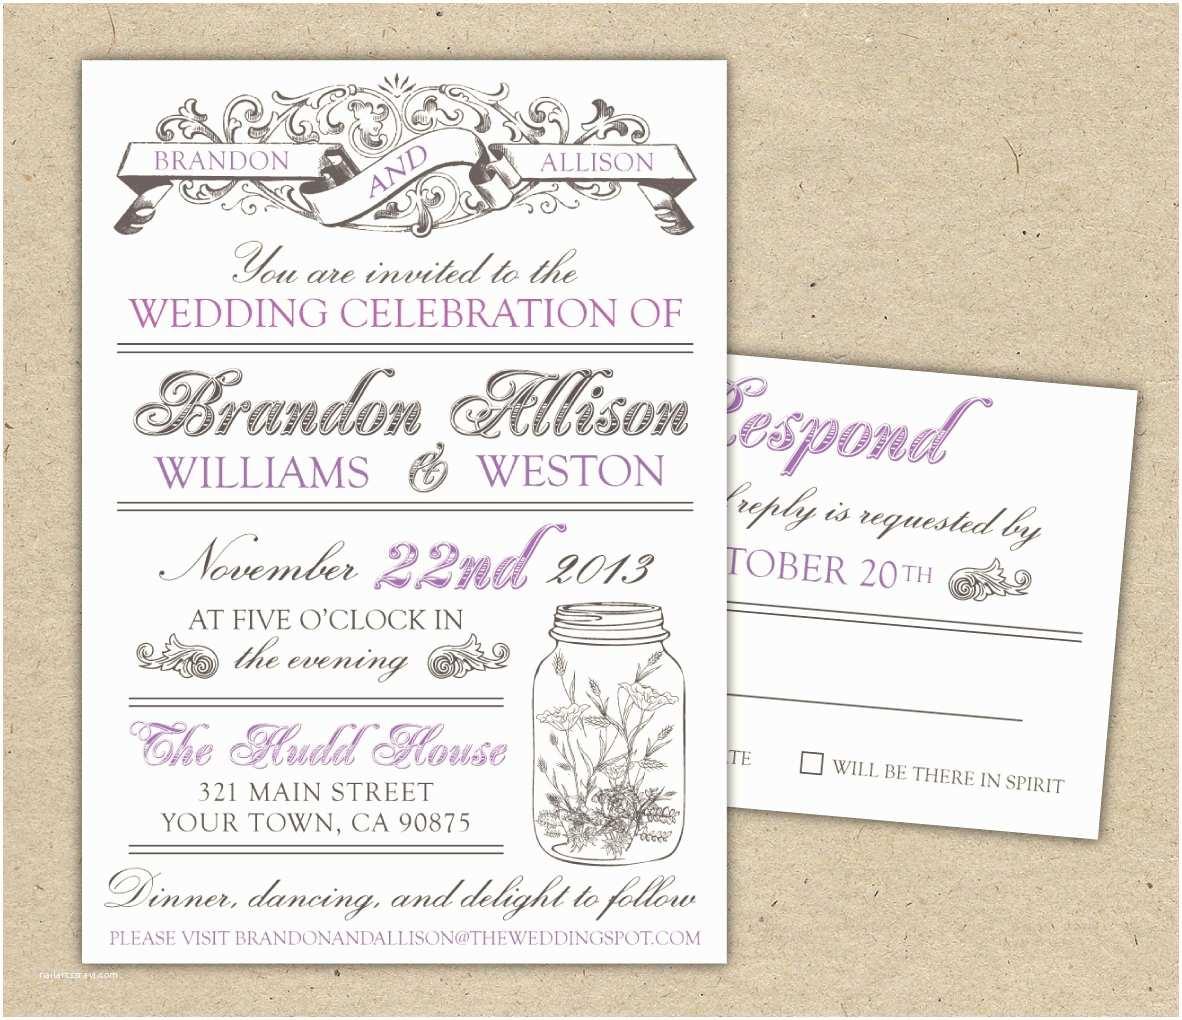 Wedding Invitation With Photo S Vintage Wedding Invitations